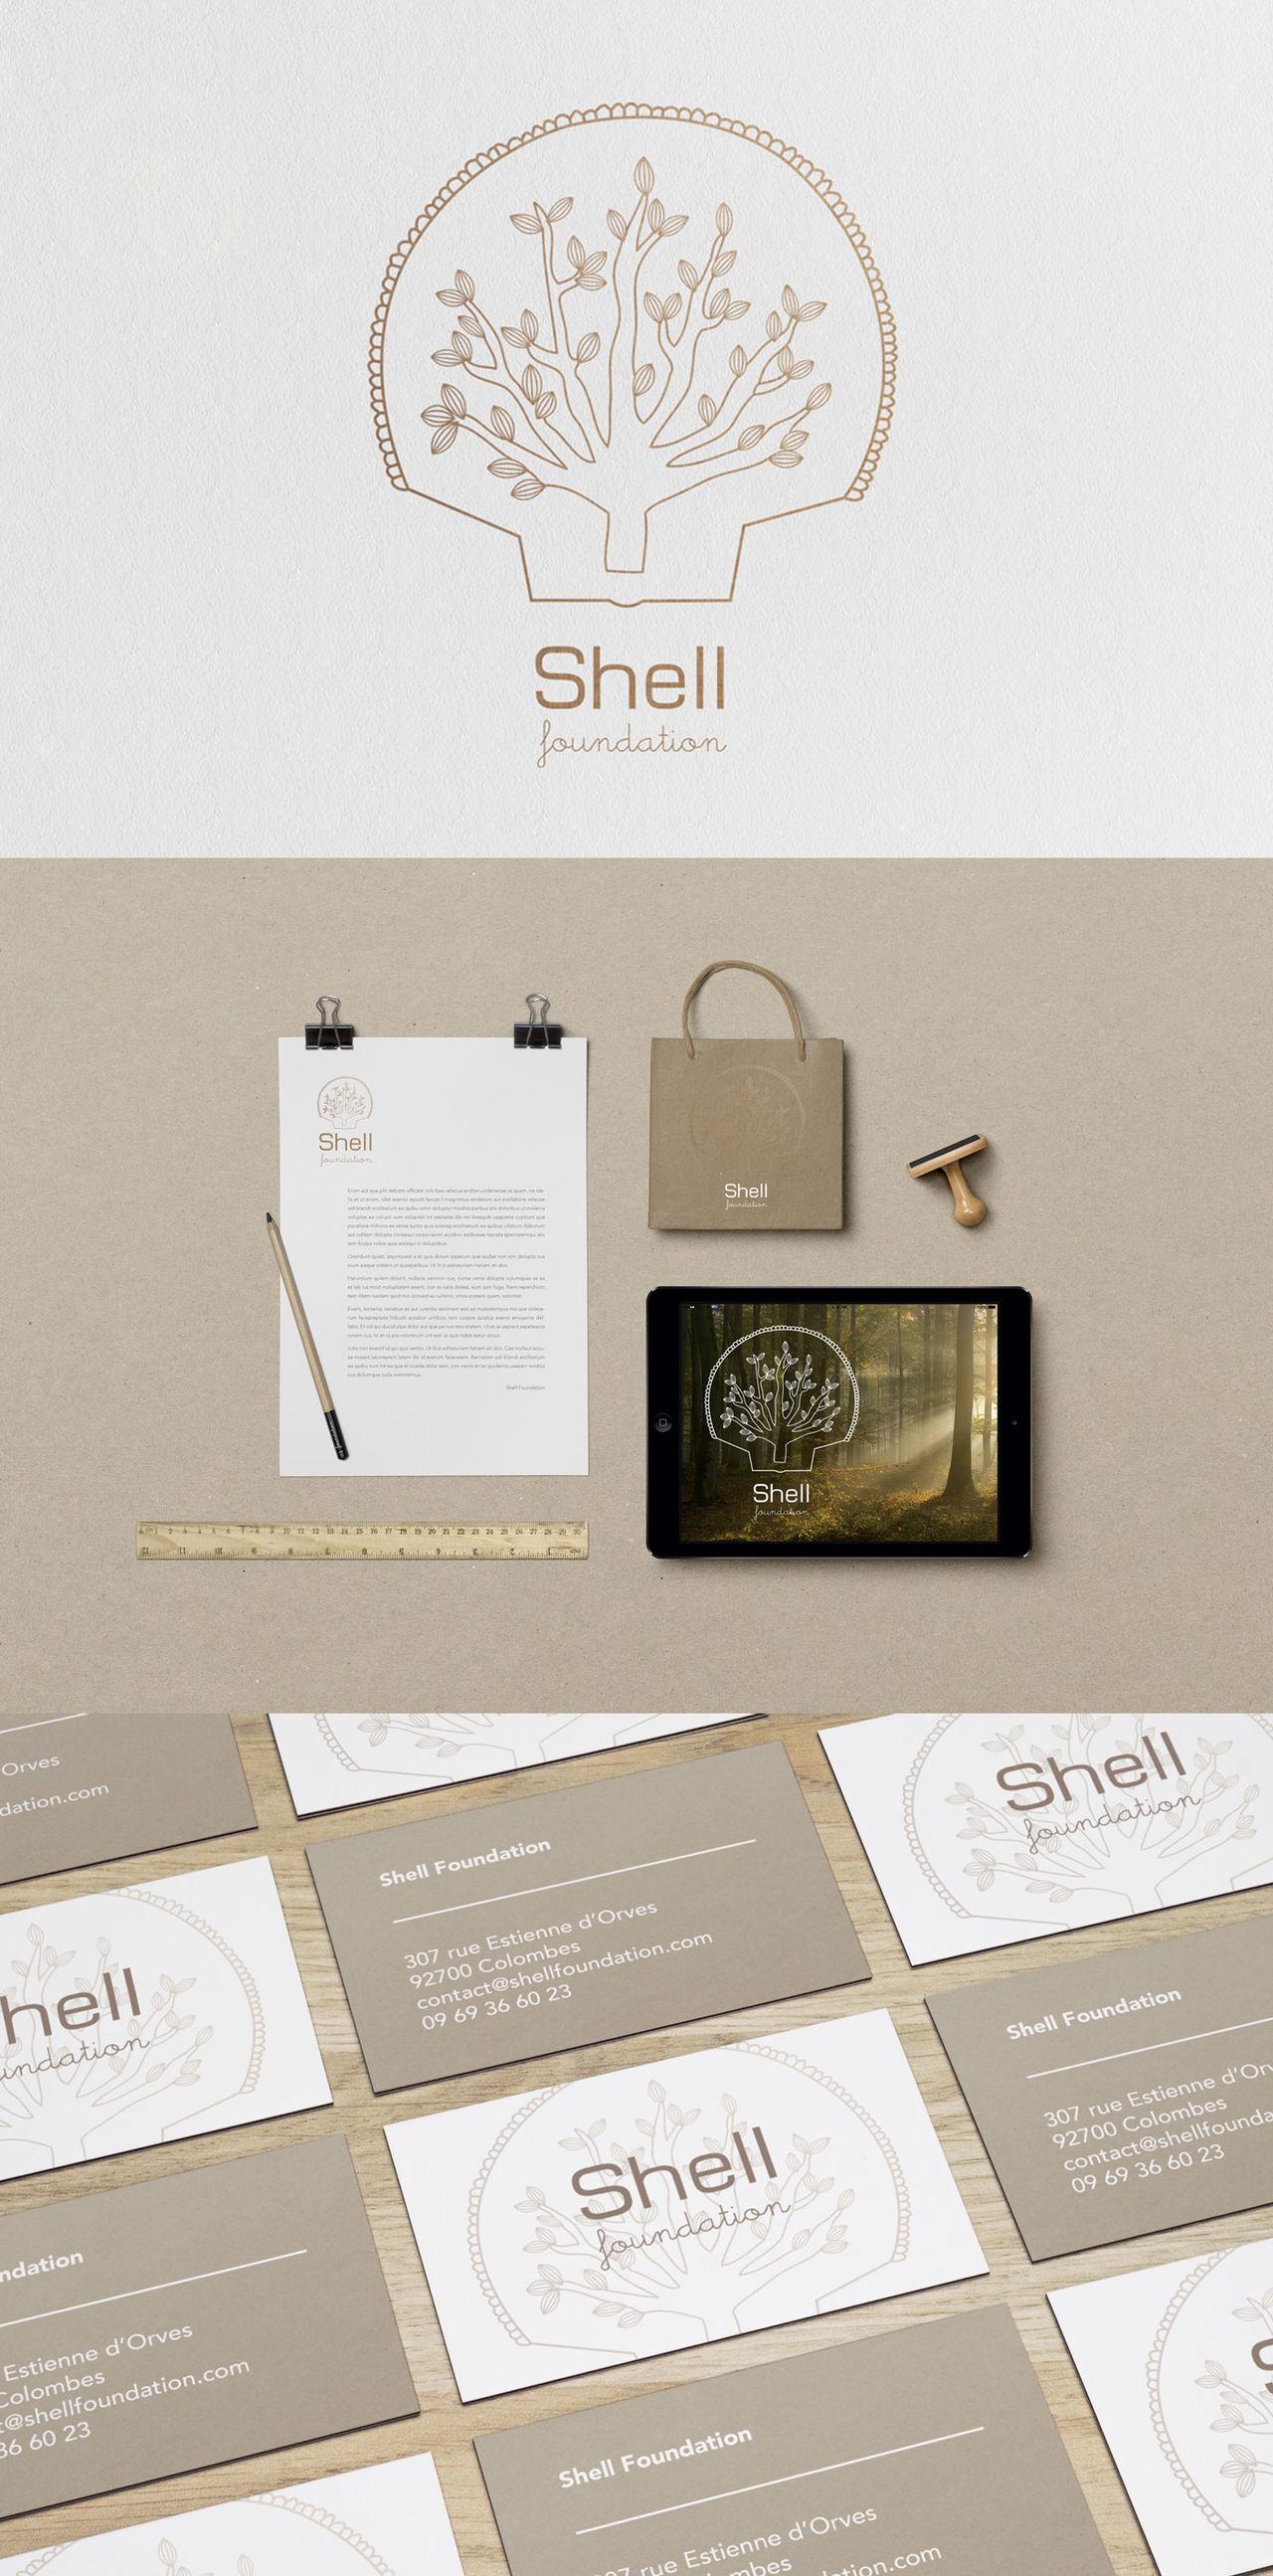 Fondation Shell